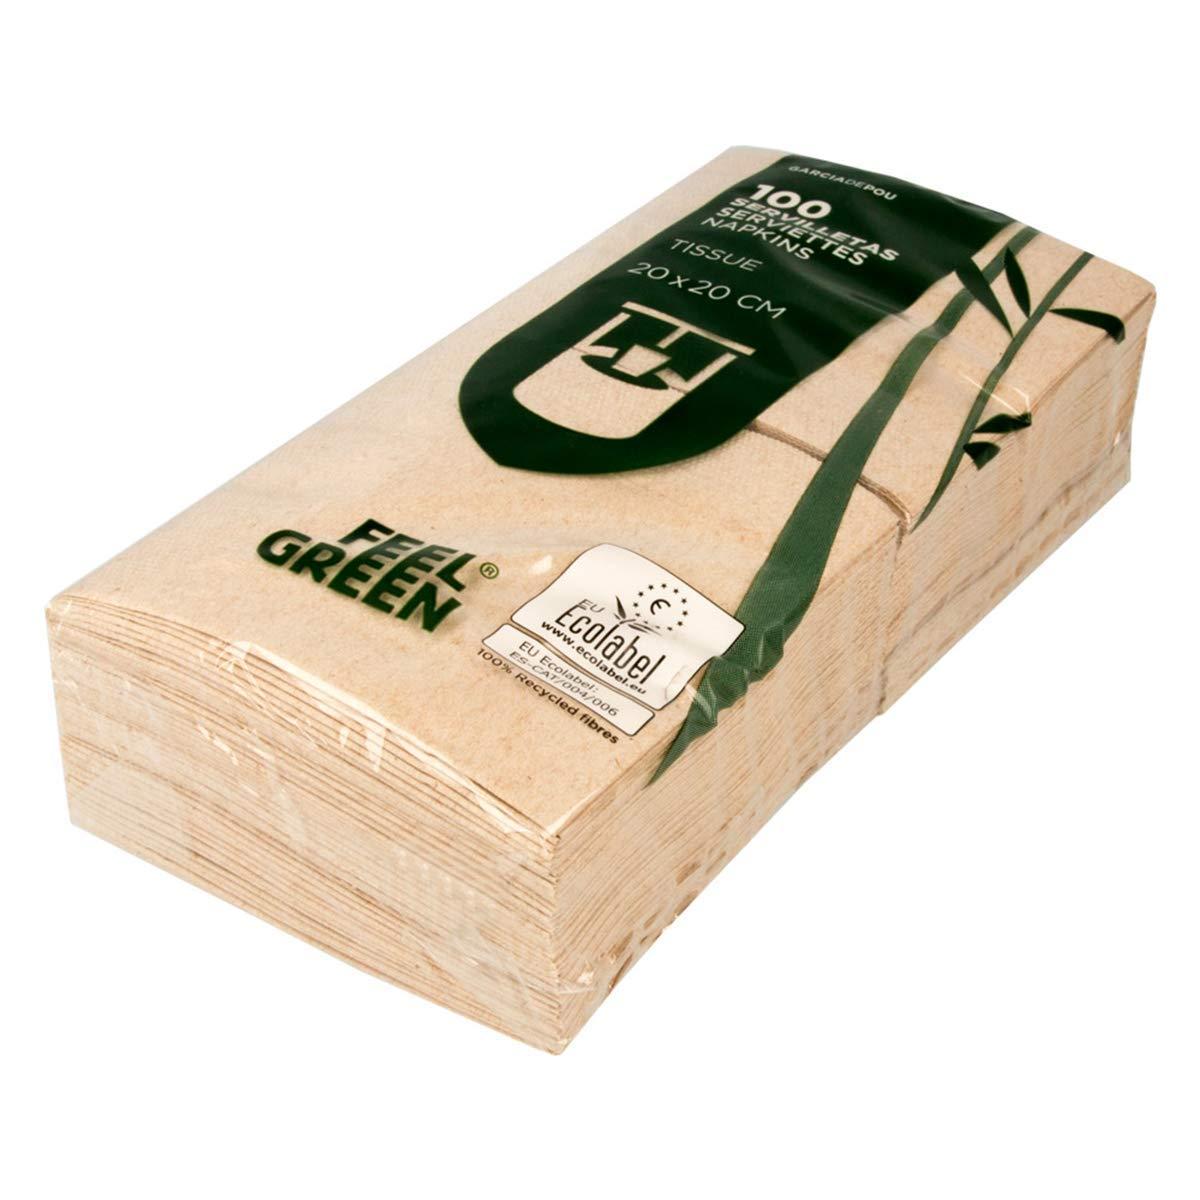 Garcia De Pou - Servilletas reciclados 2 capas 18 G/m² en caja ...